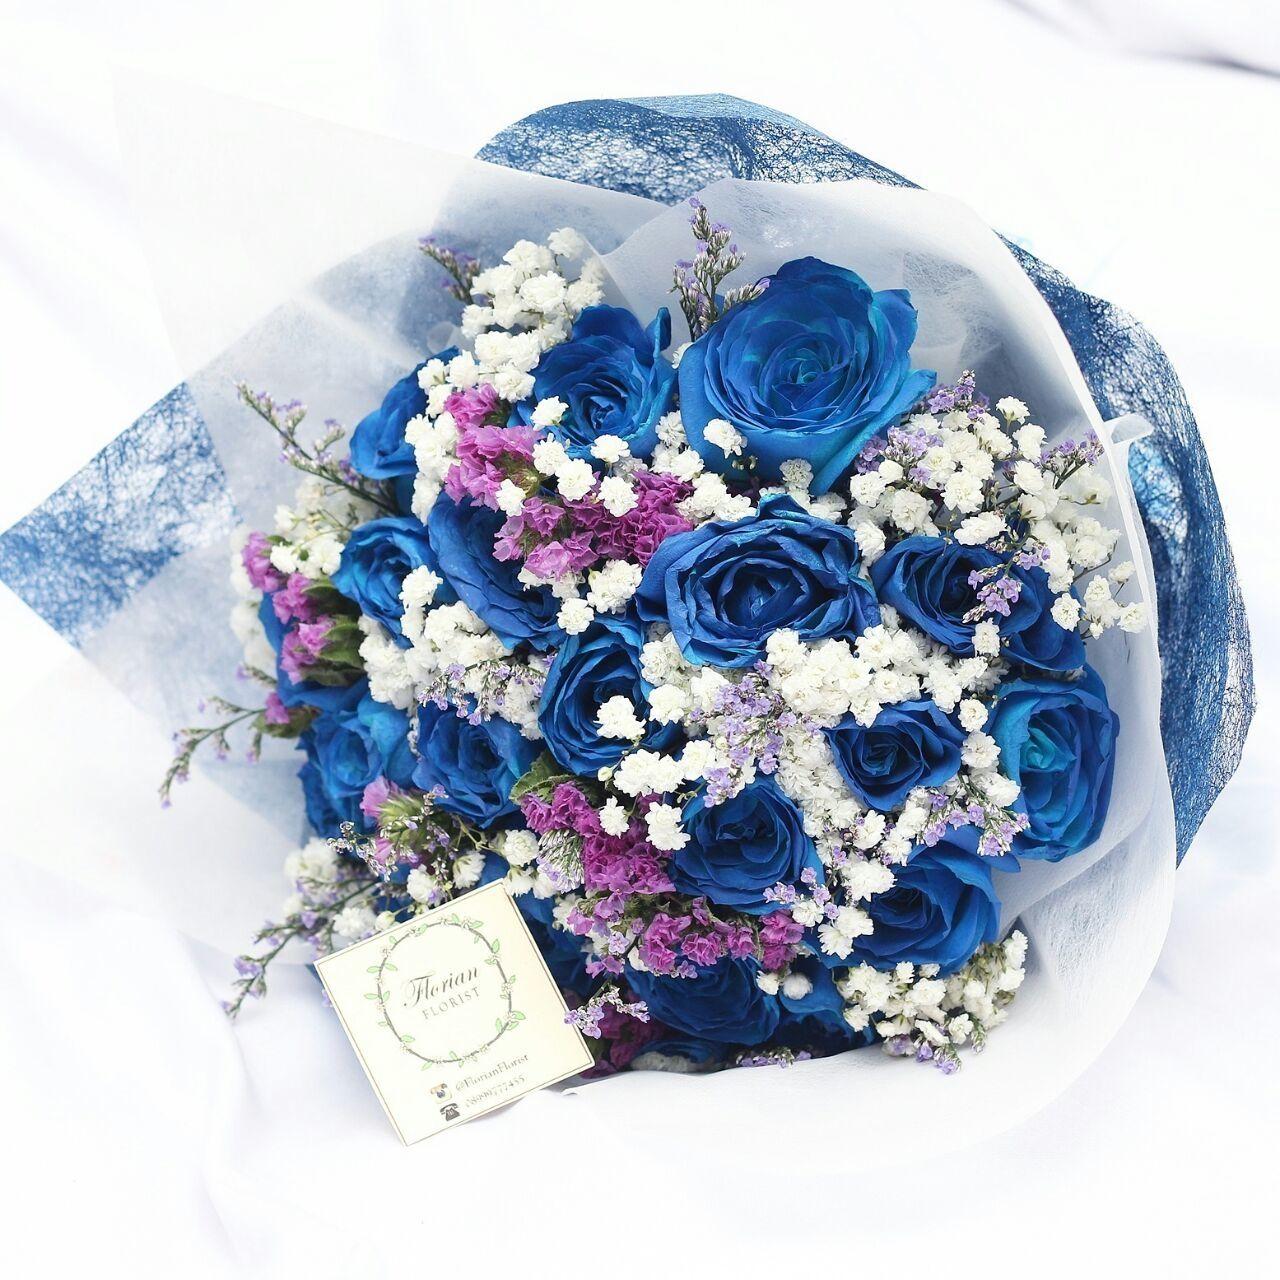 Royal blue wedding handbouquet project by florian florist http royal blue wedding handbouquet project by florian florist httpbridestory izmirmasajfo